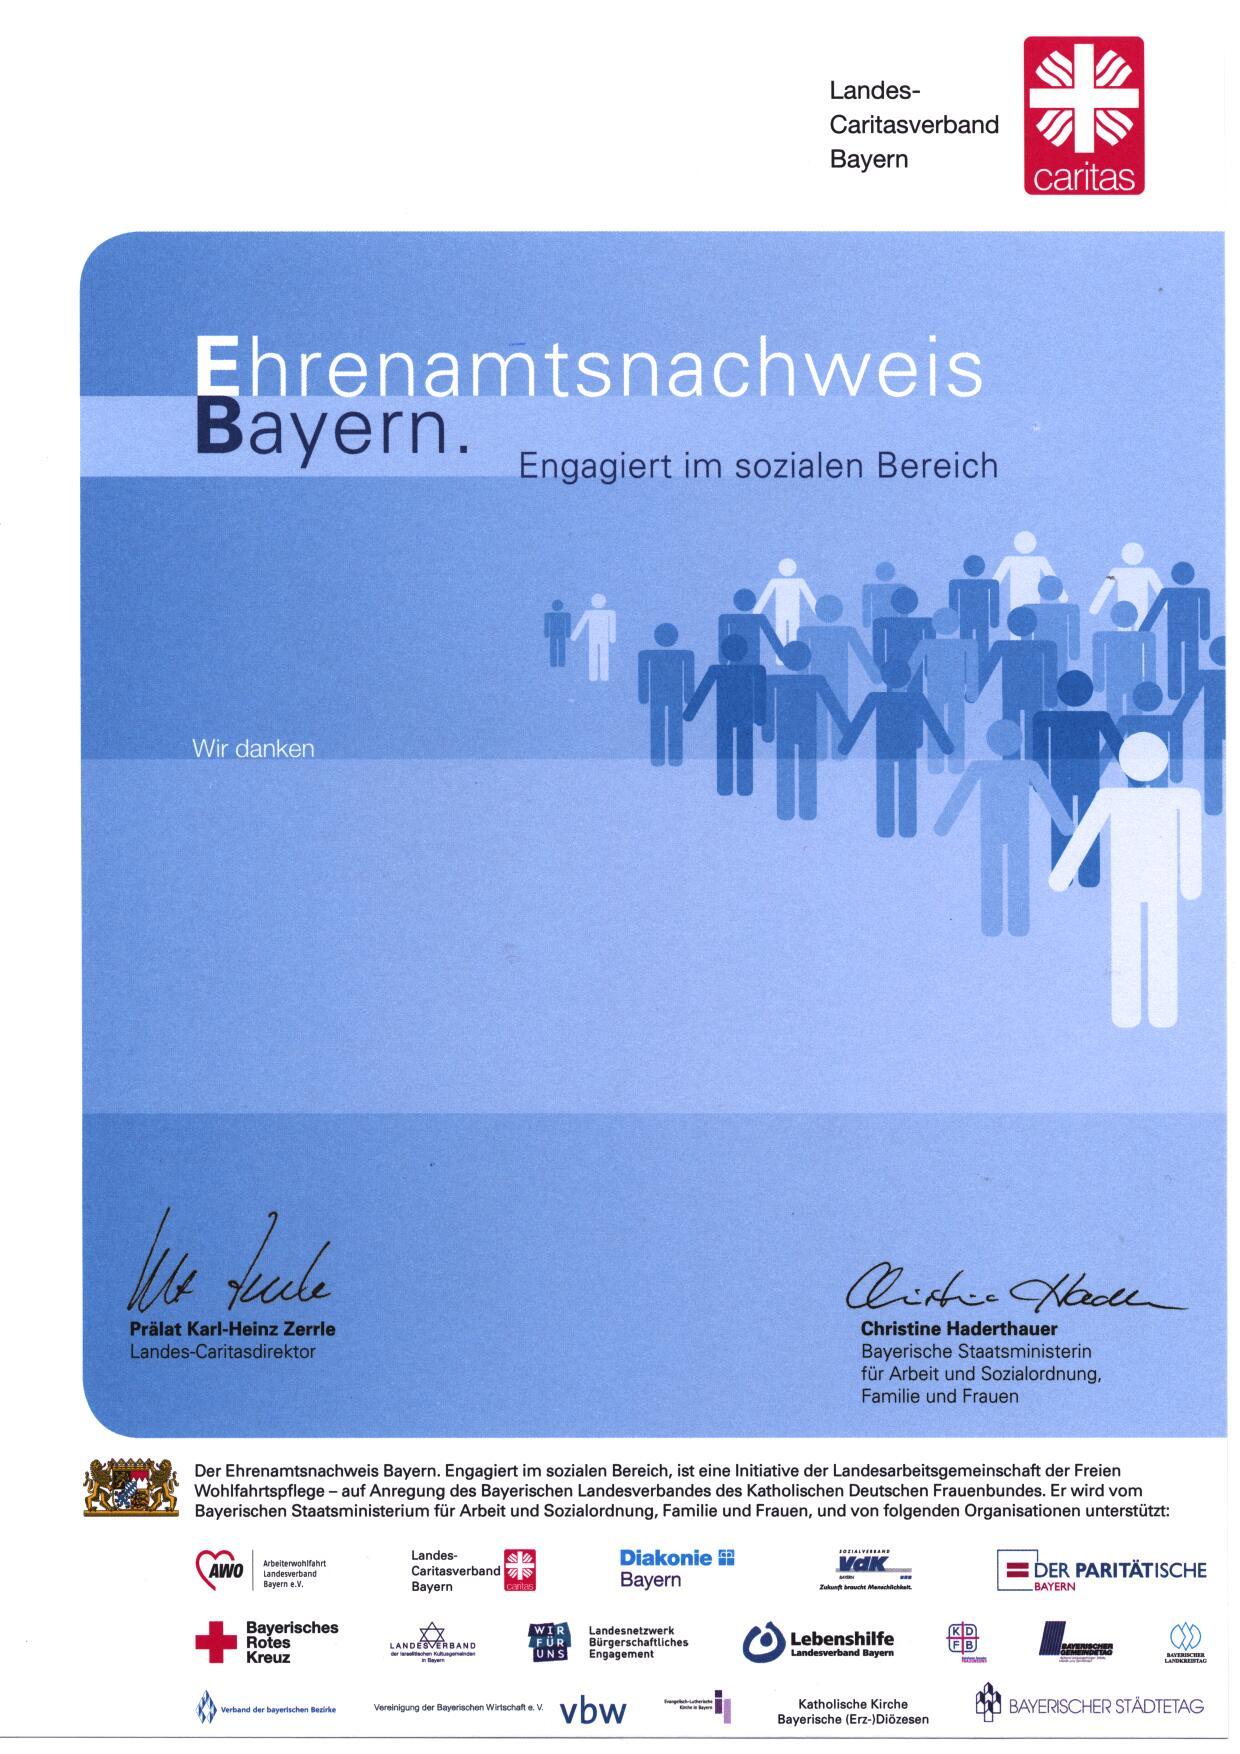 Ehrenamtsnachweis Bayern